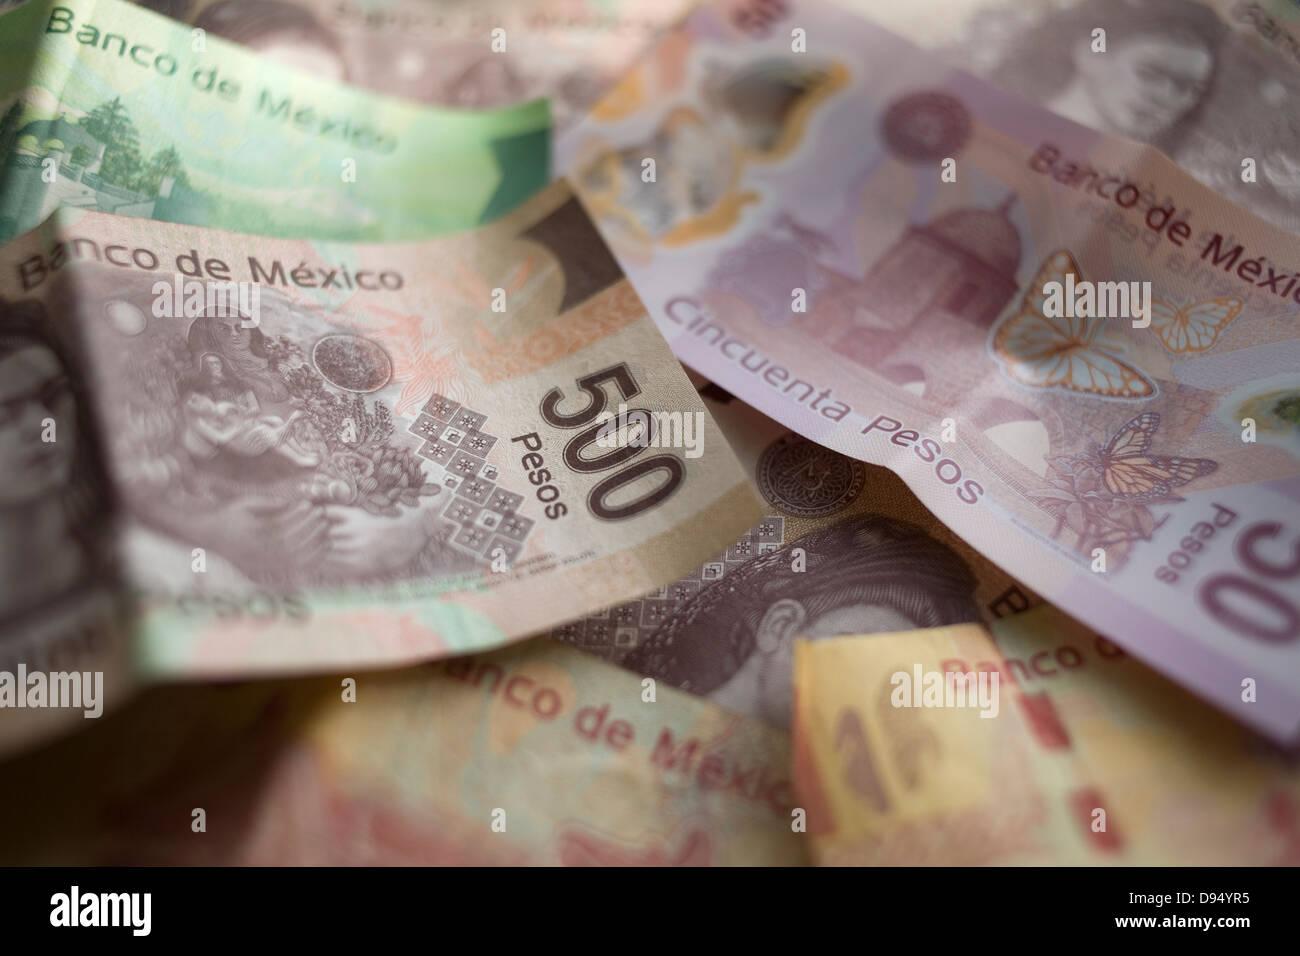 Mexican Pesos - Stock Image